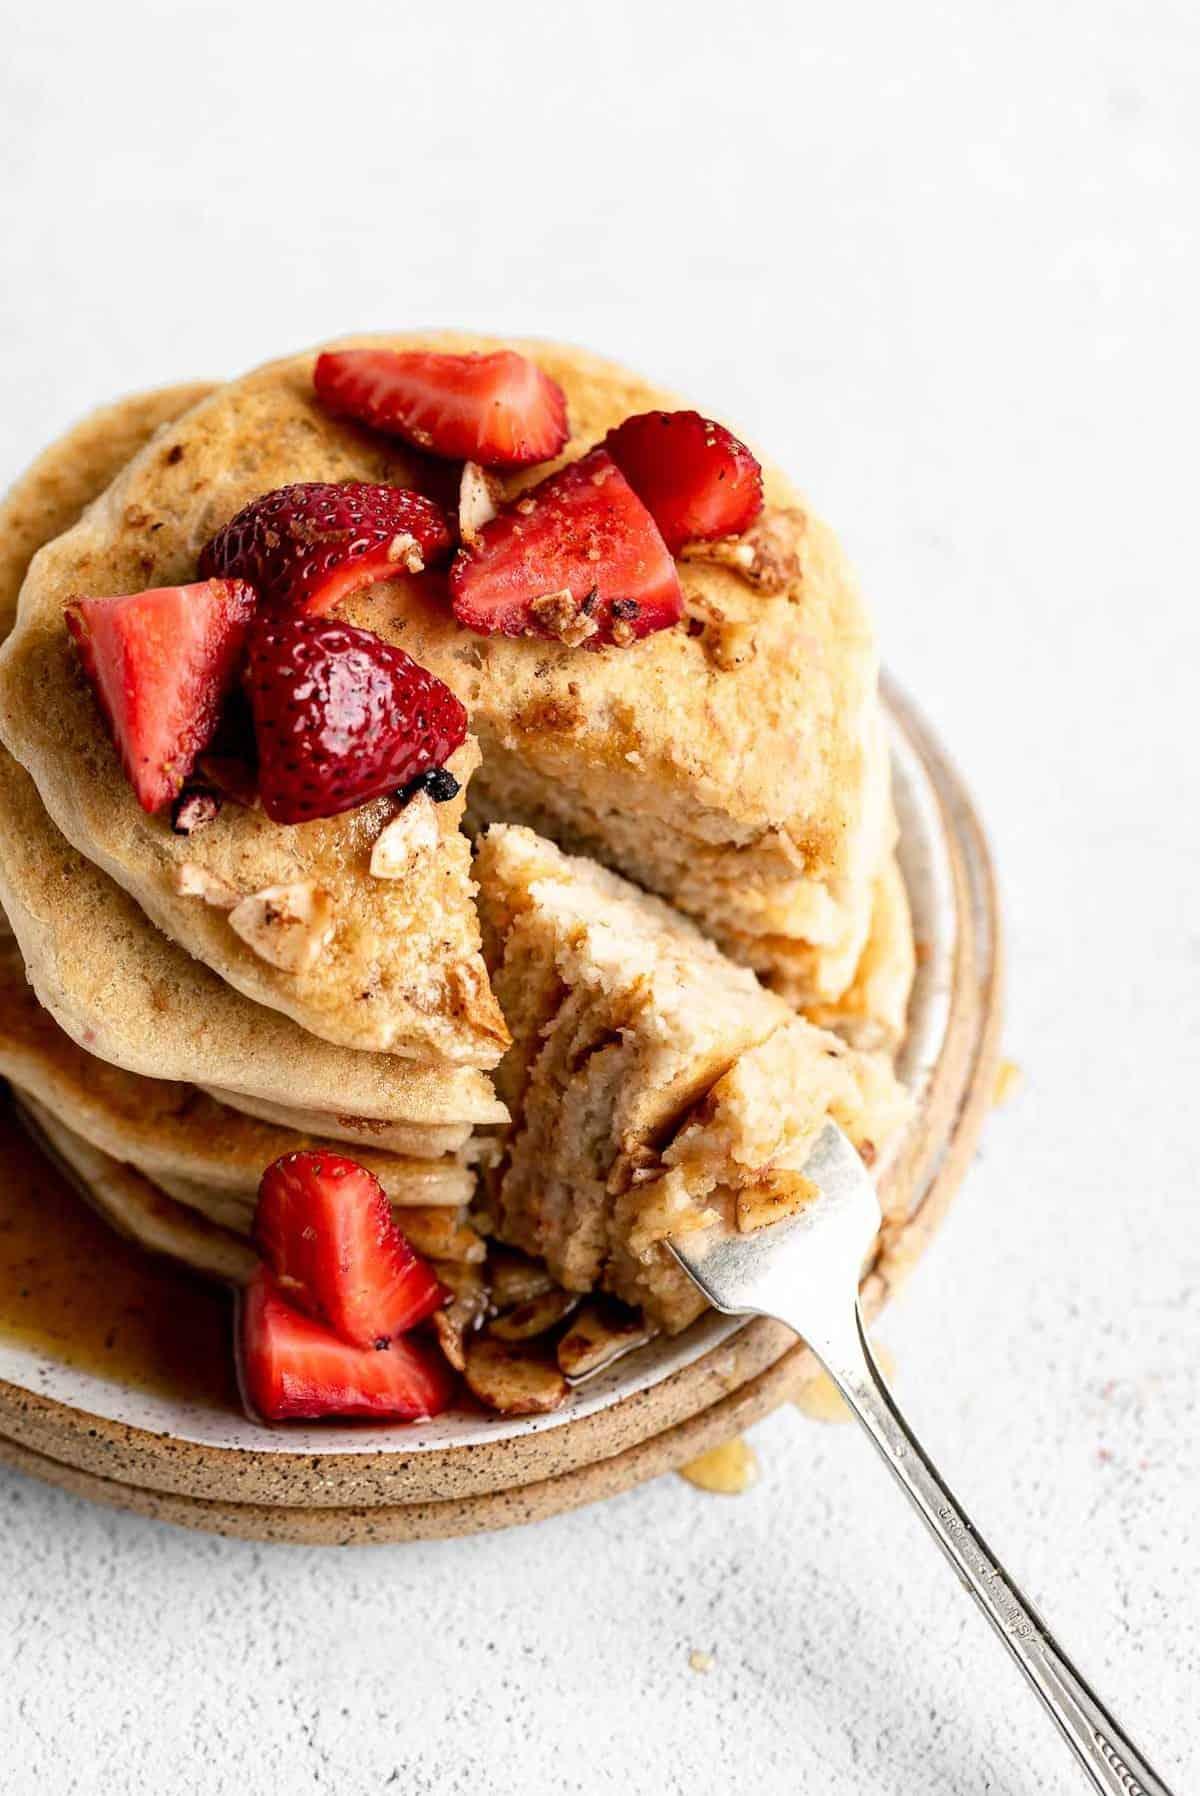 vegan protein pancakes with one bite taken out to show texture